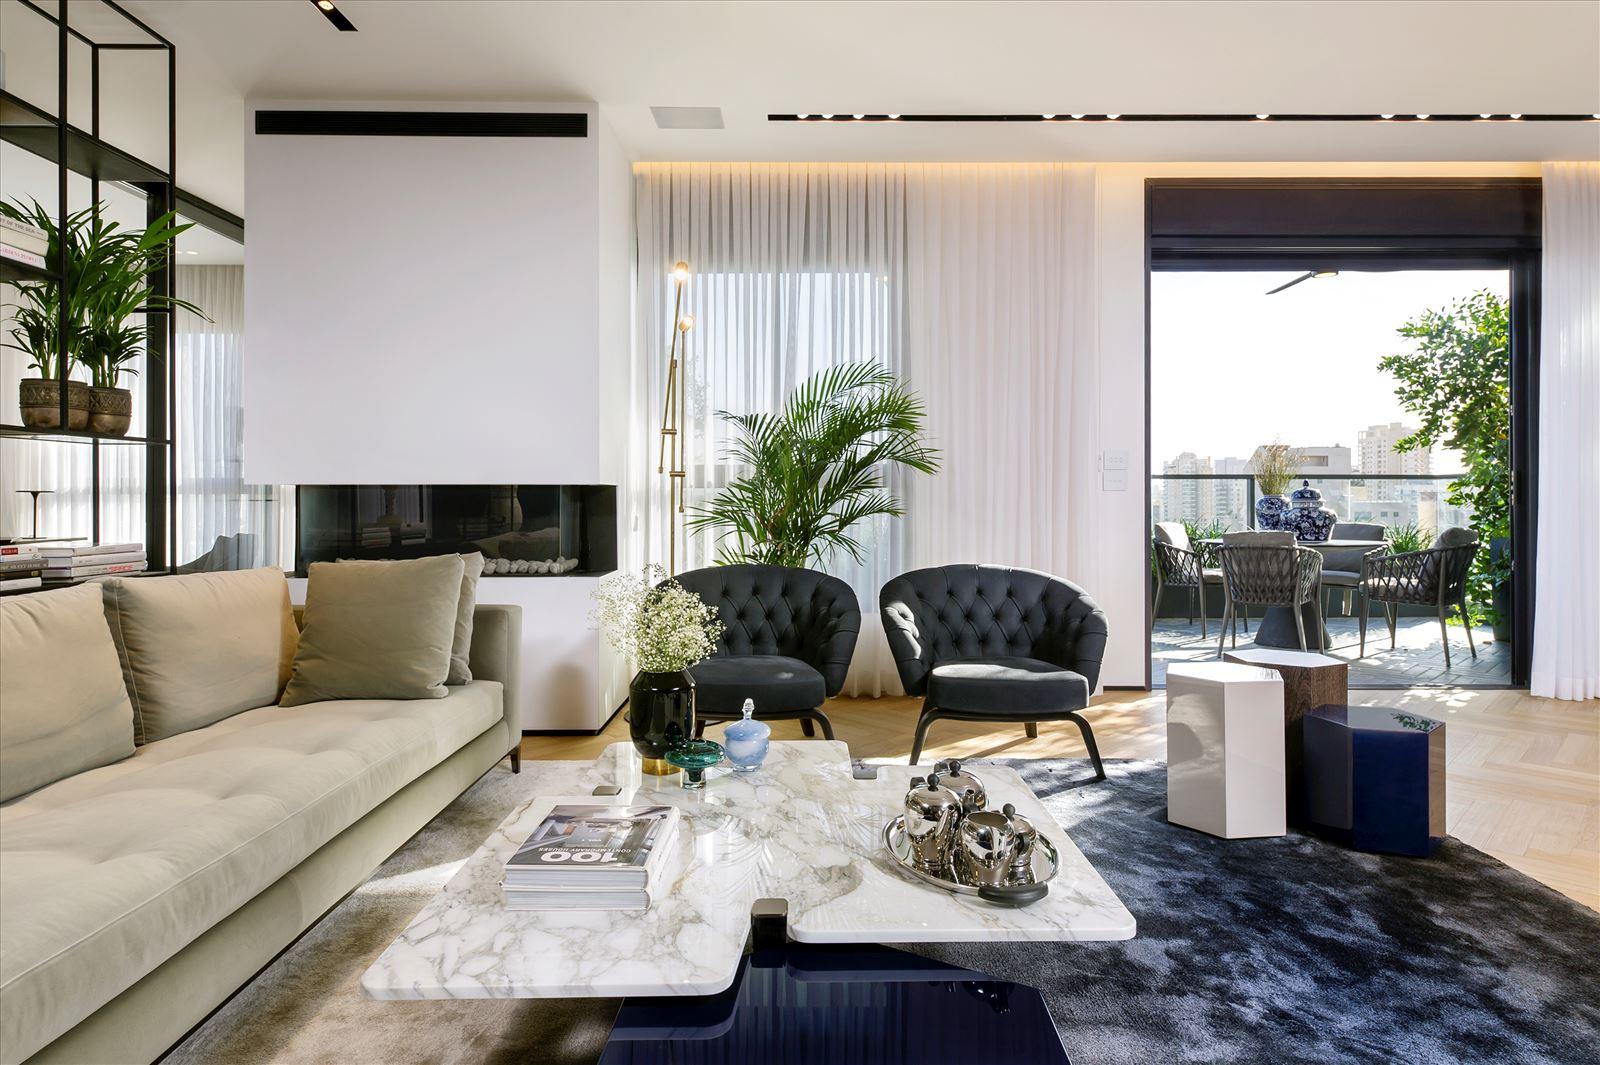 Penthouse - Petah Tikva גוף תאורה עומד המאיר את ספות הסלון נעשה על ידי דורי קמחי